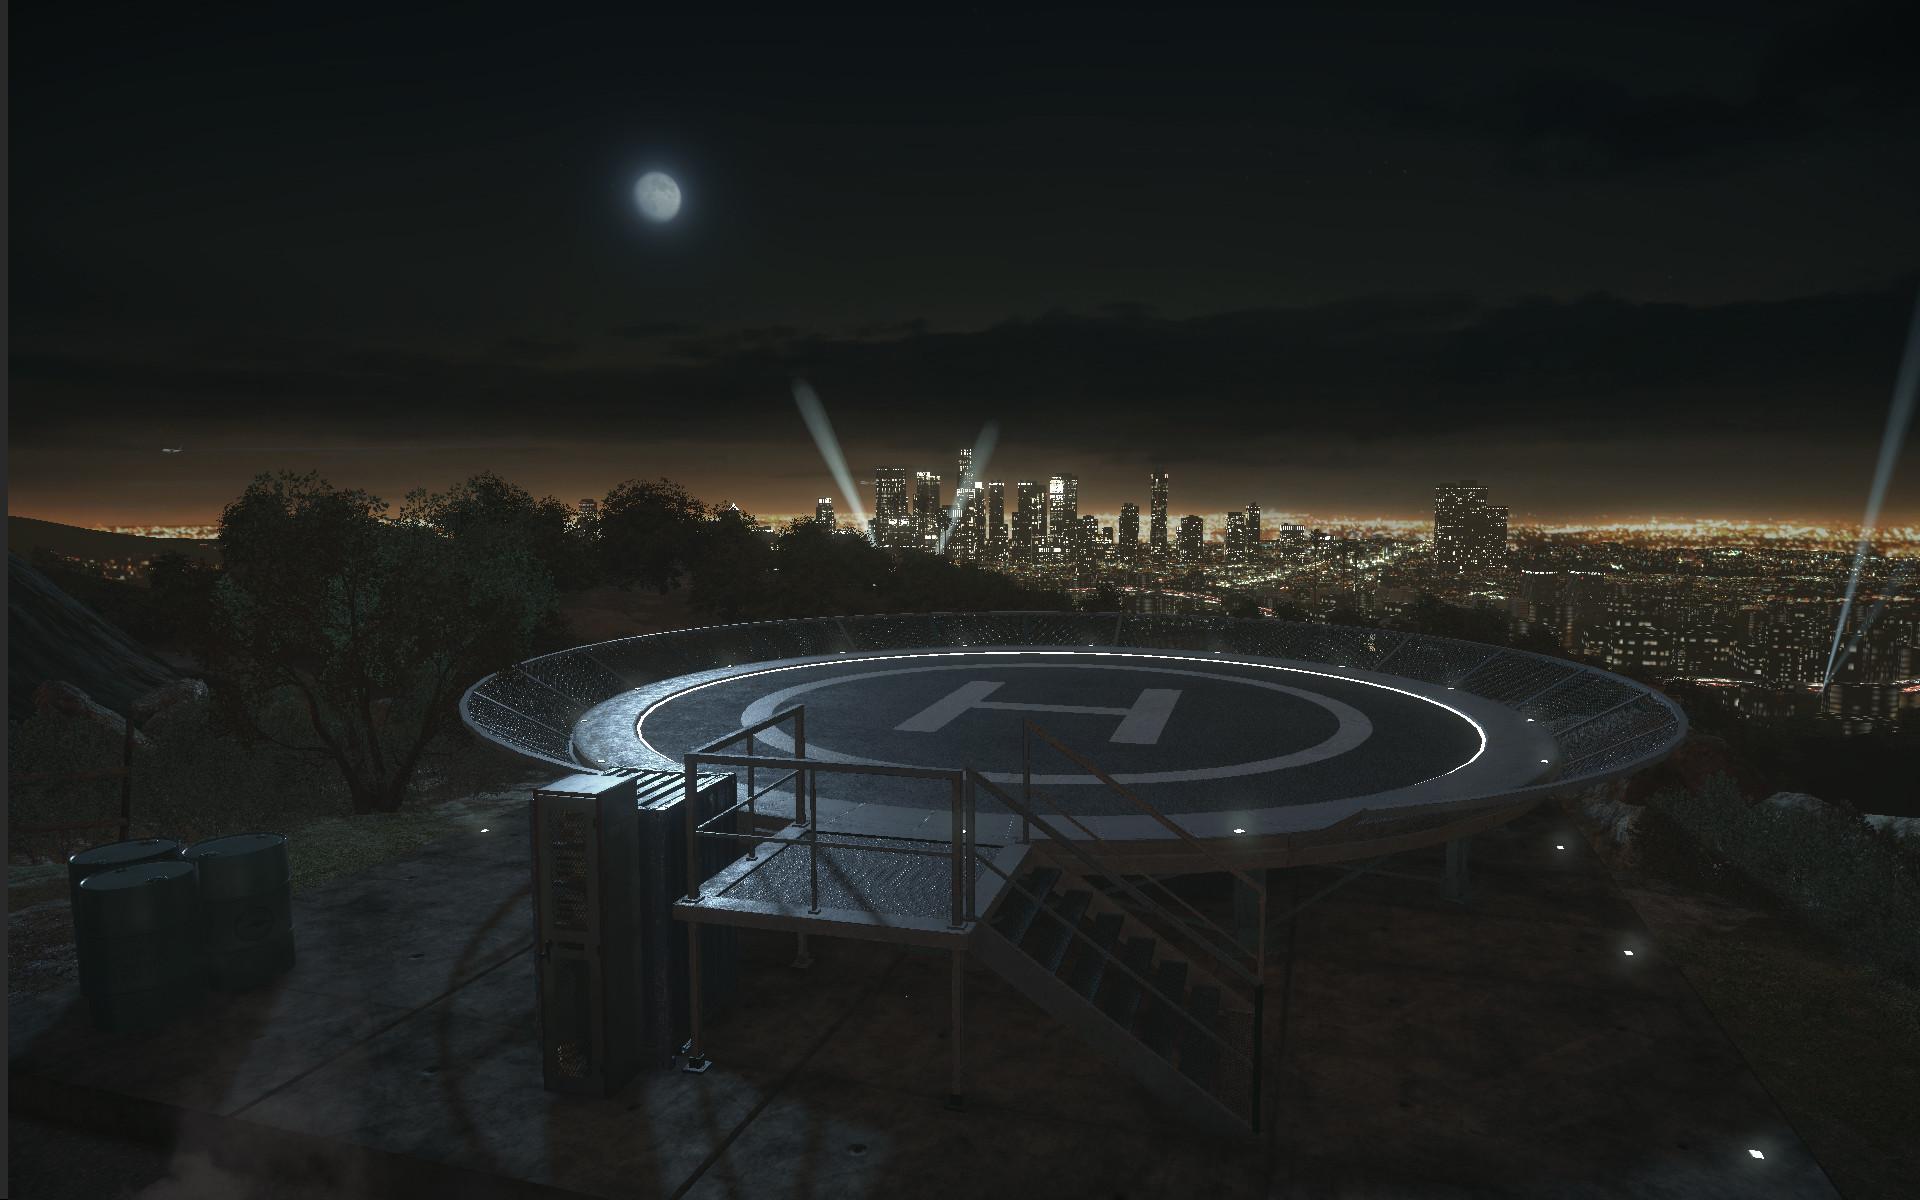 Cordell felix multiplayer heights 02